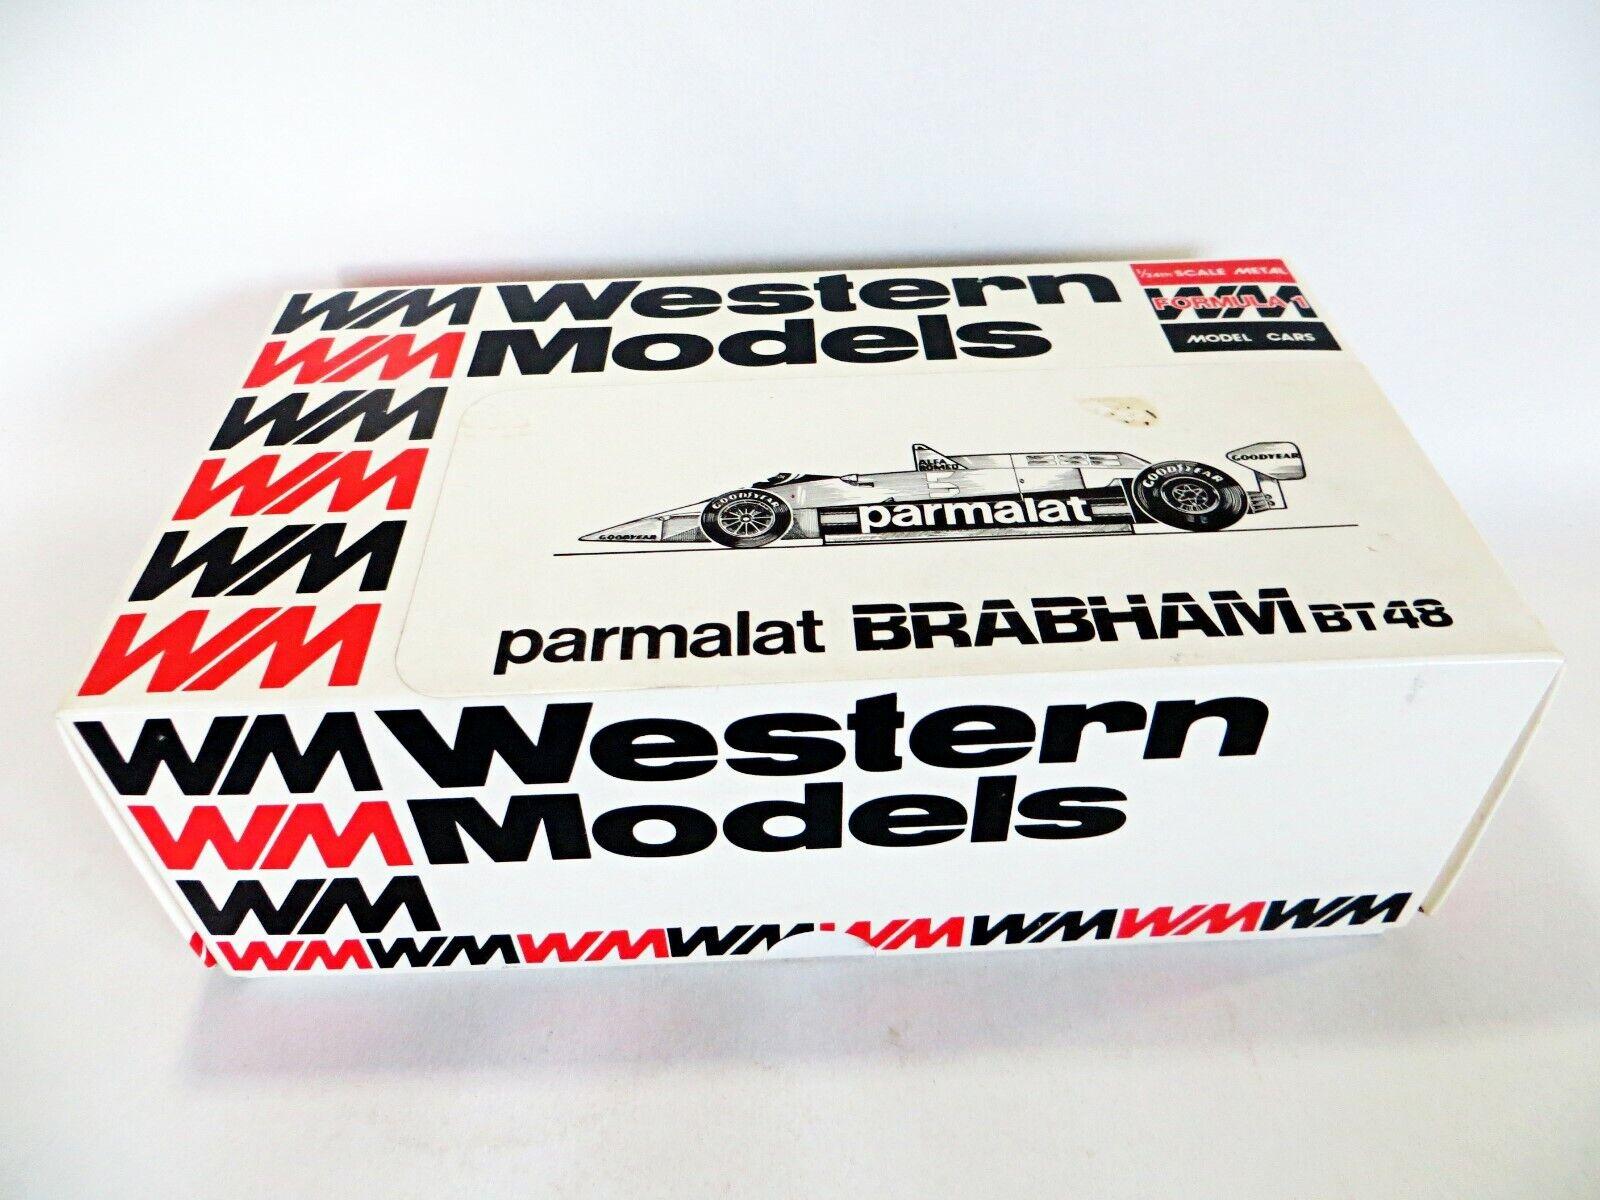 Western modellos 1 24' 1979 Parmalat Brabham BT48 F1 AUTO RARO modelloLO KIT.